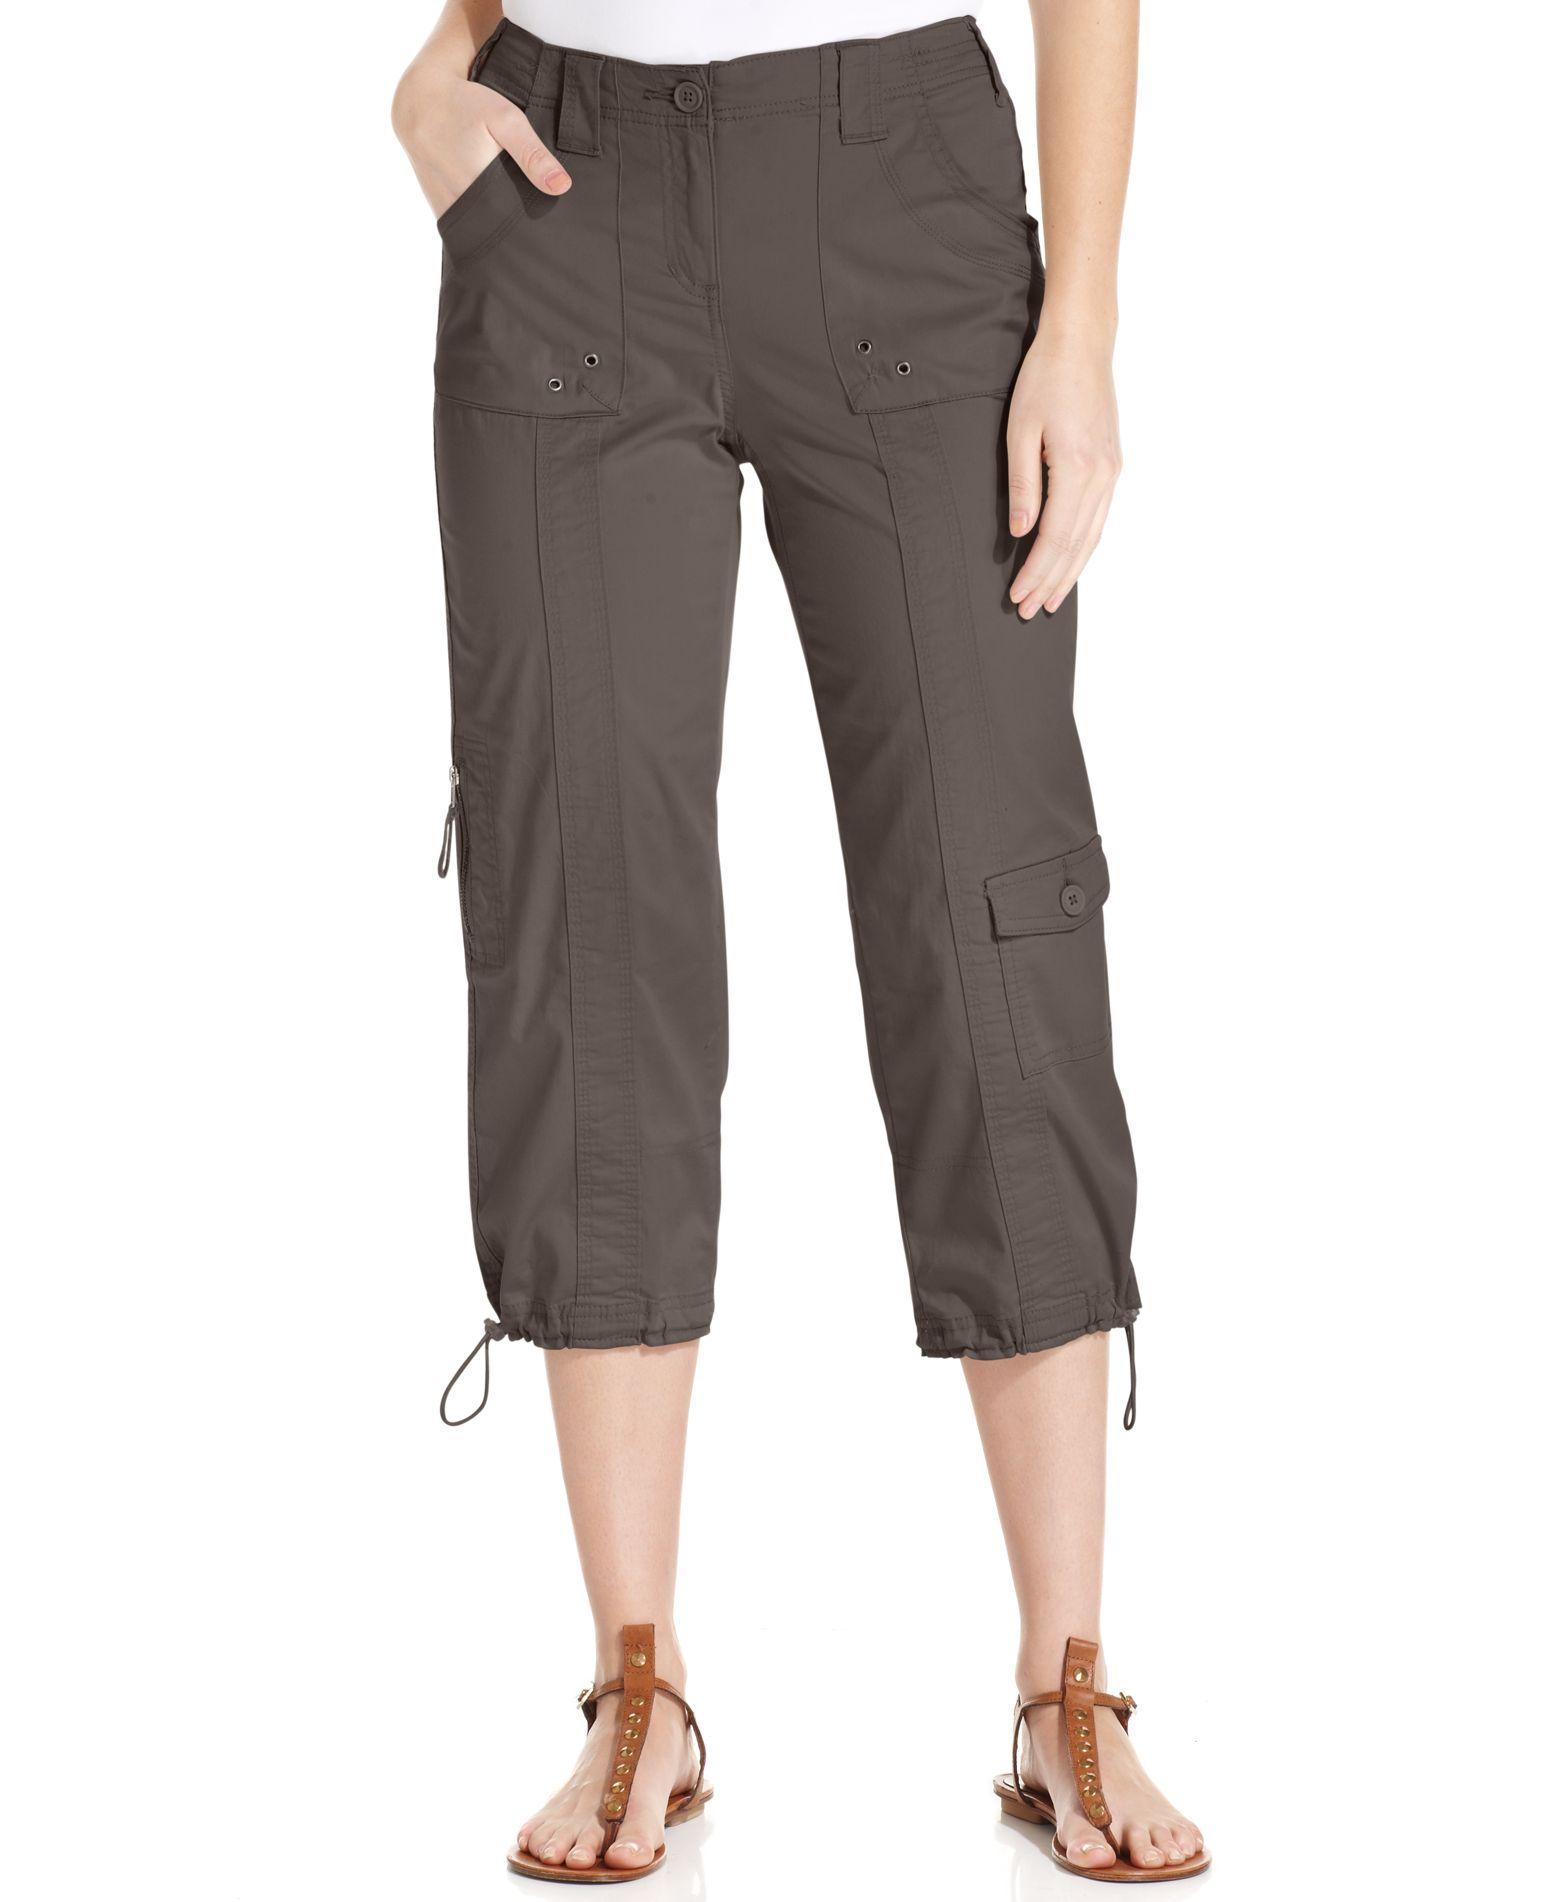 Style & Co. Cargo Capri Pants